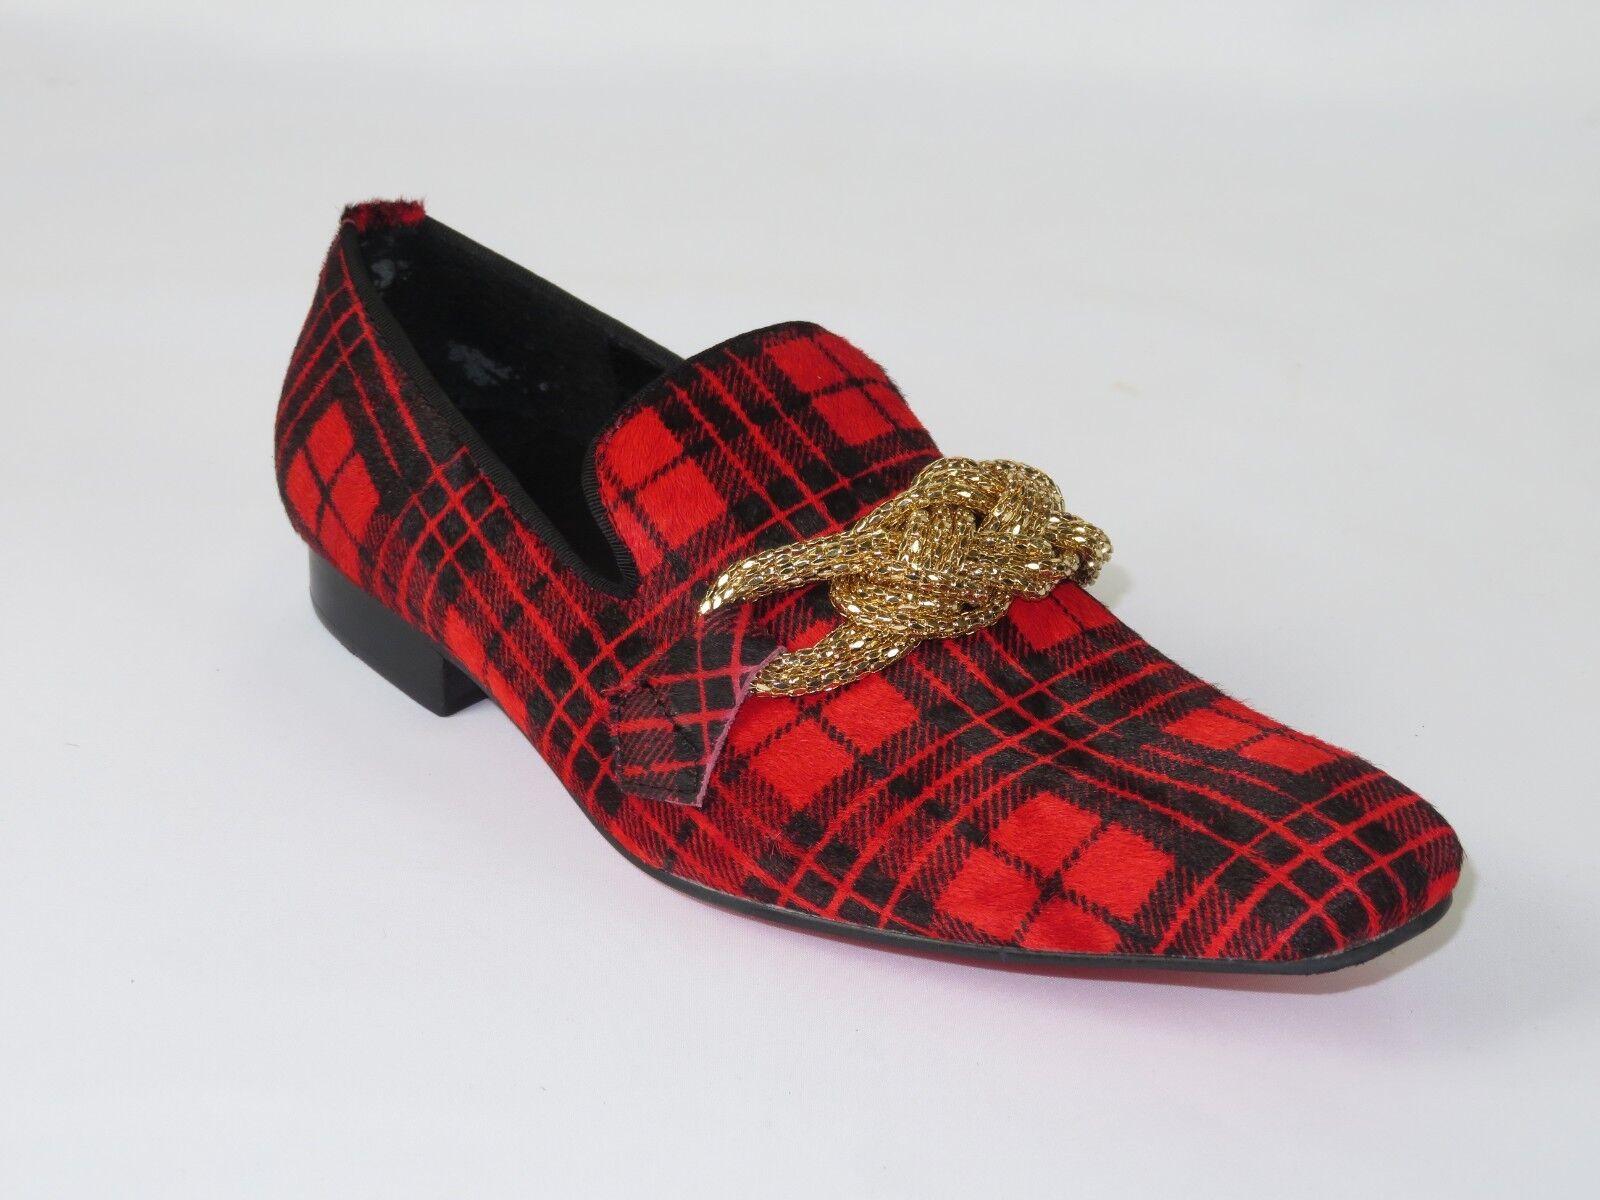 Zapatos para hombre Fiesso por Aurelio Garcia Pony Cabello inglés a cuadros Slip On Fi7291 Rojo